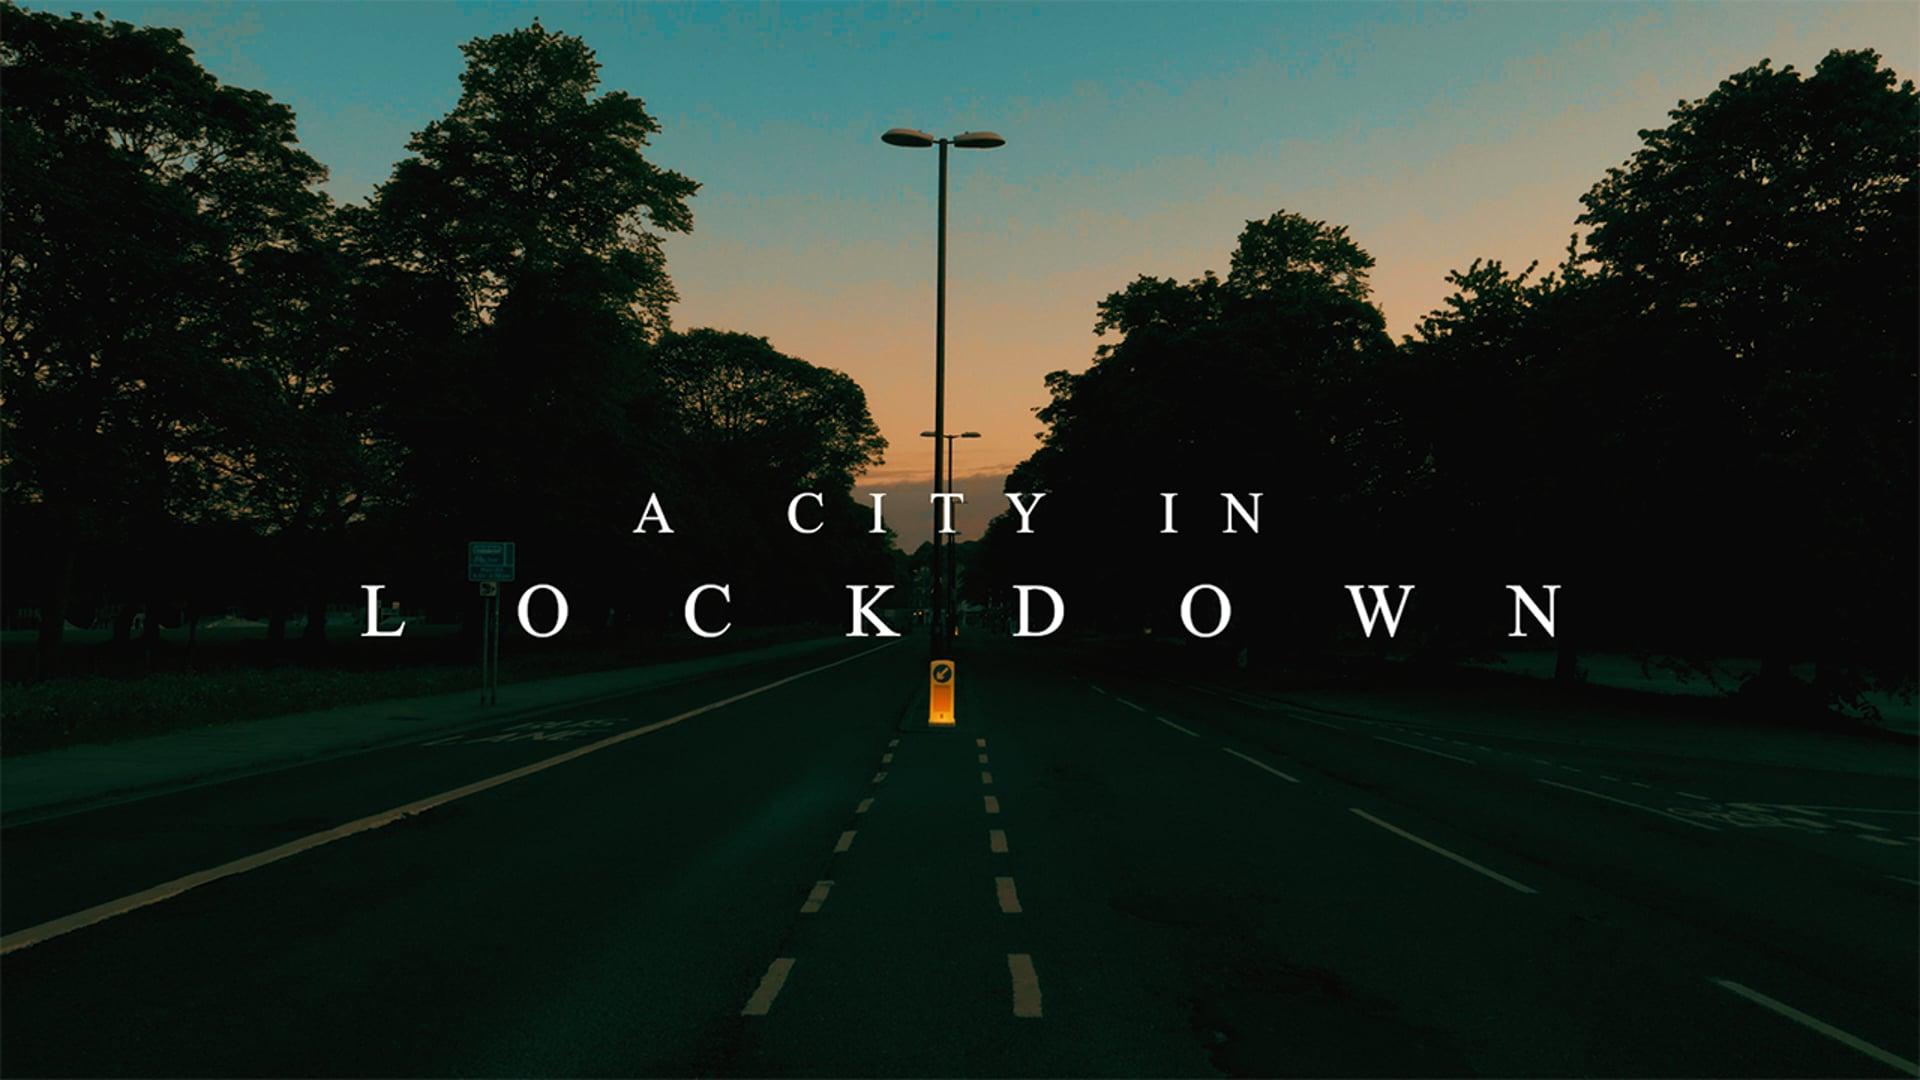 A City in Lockdown